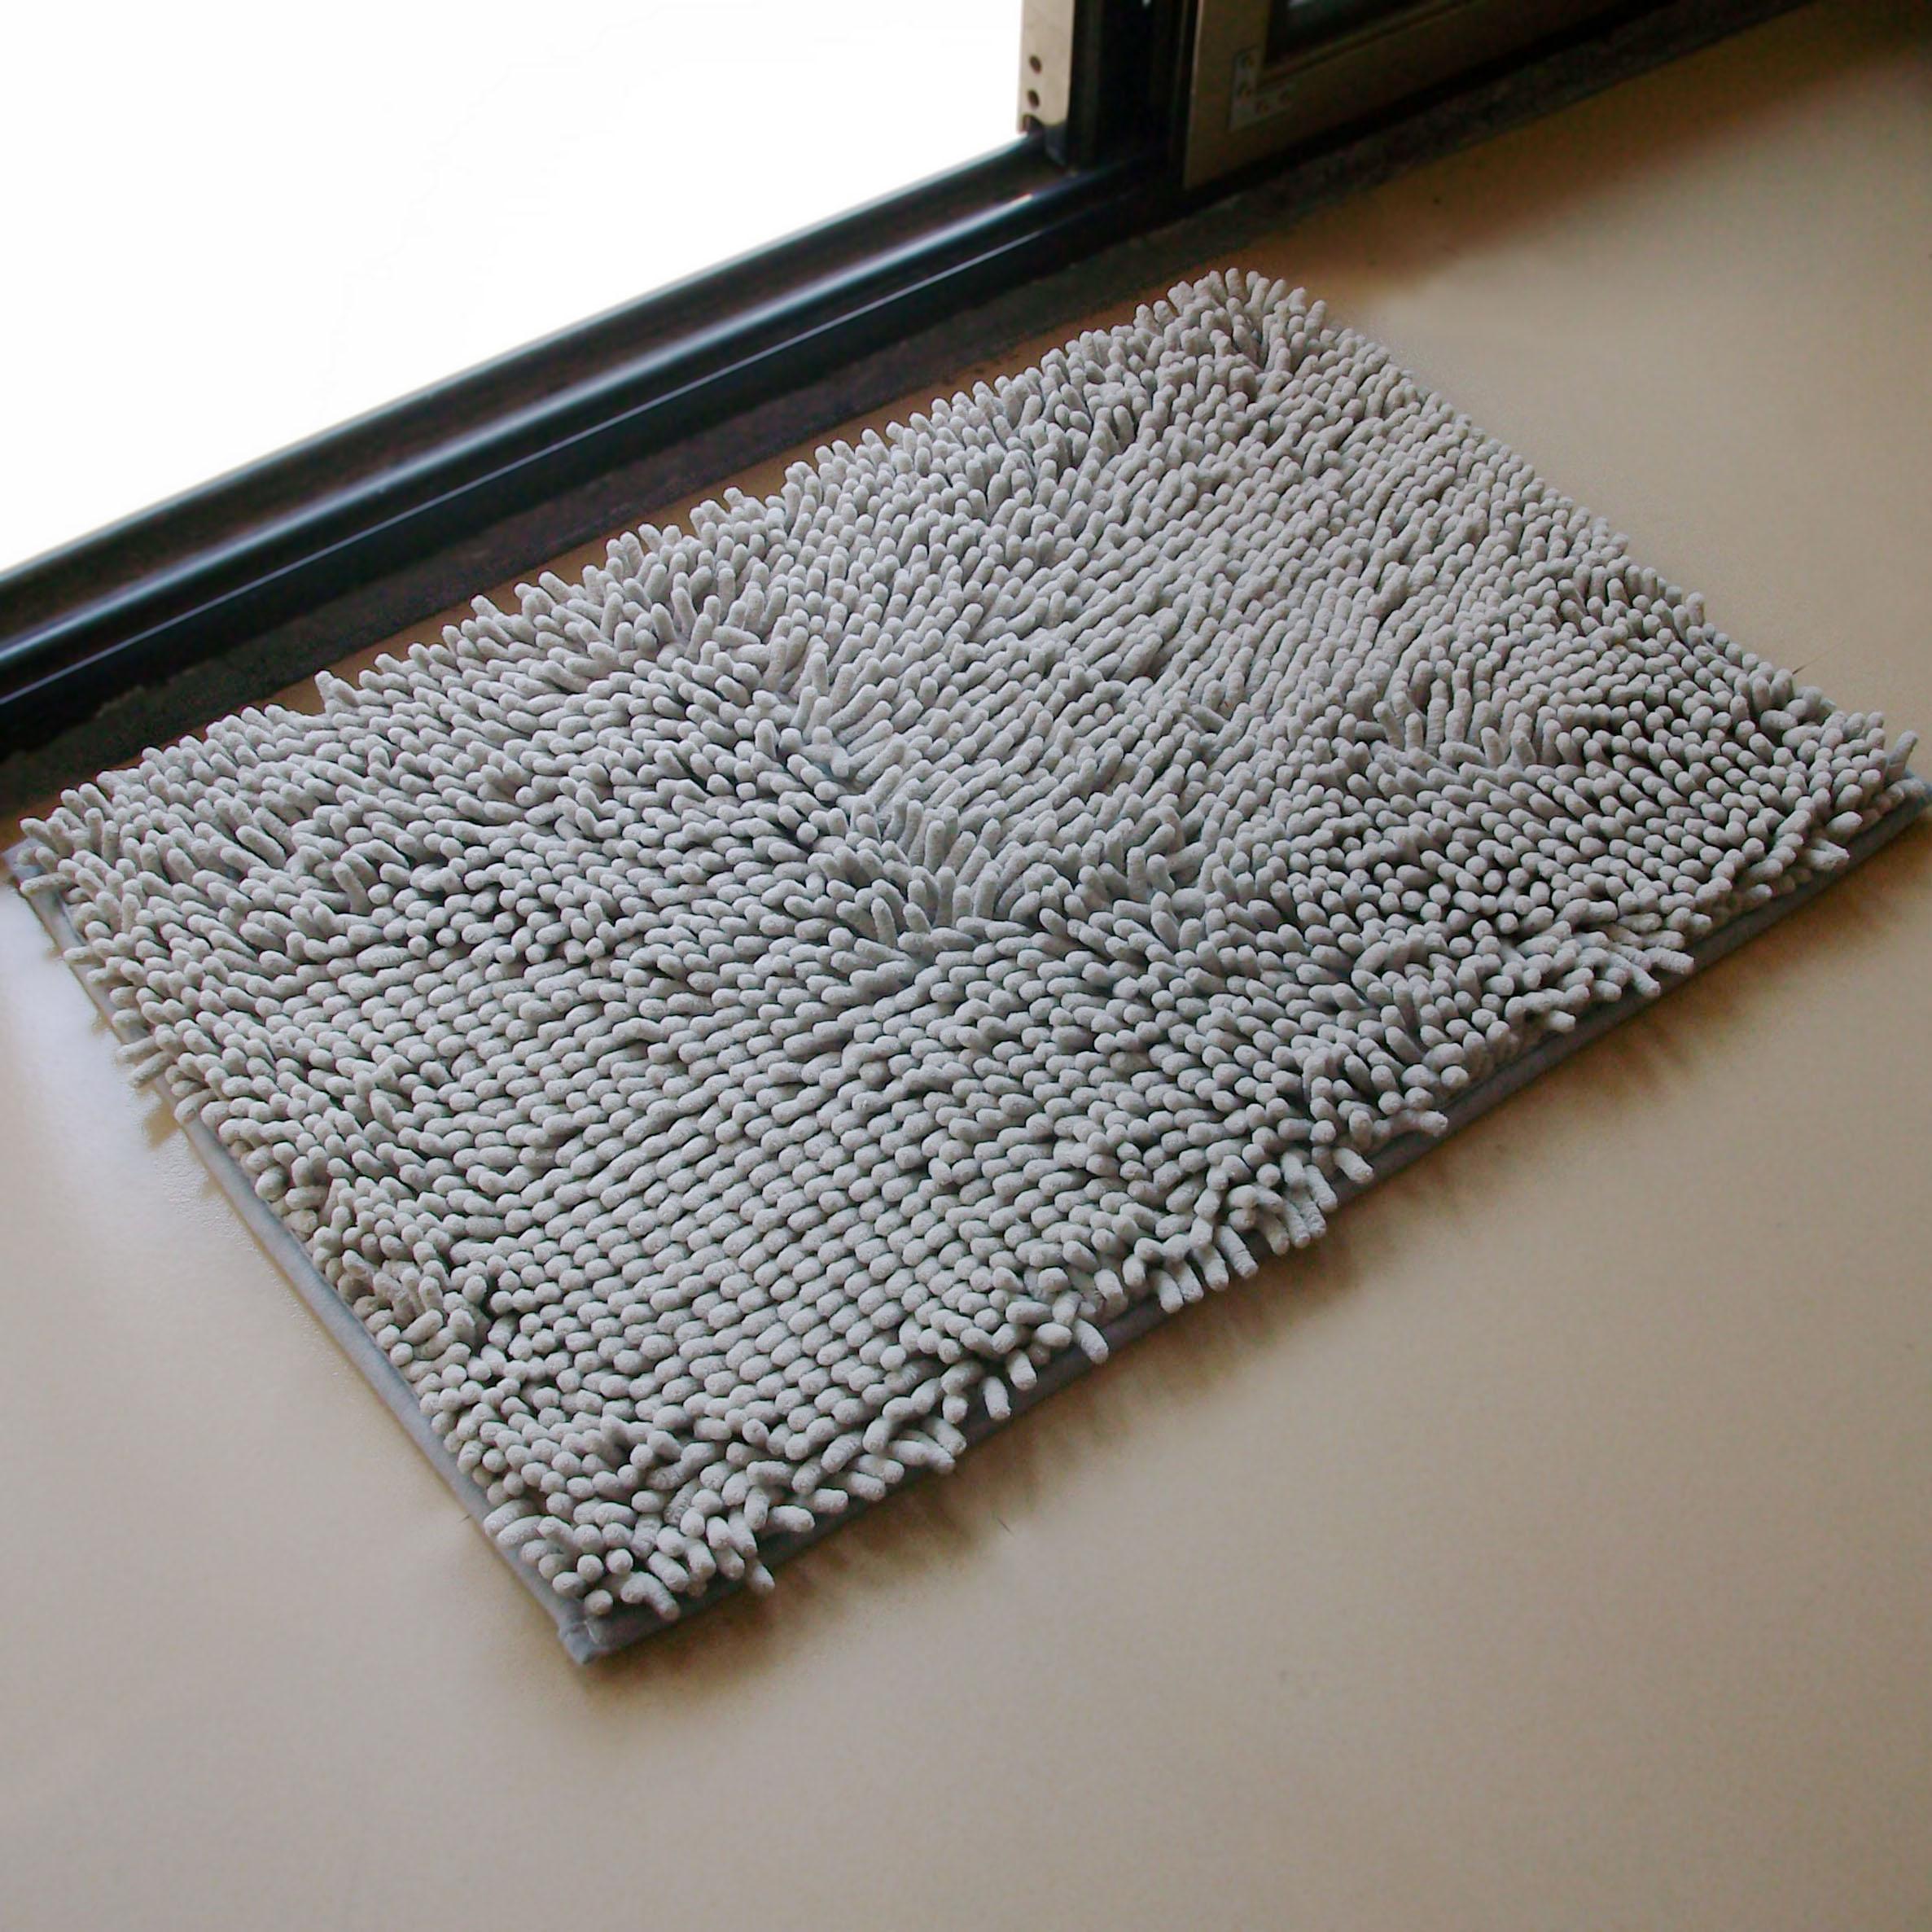 Anti Skid Shaggy Area 40 60 Microfiber Chenille Bath Mat